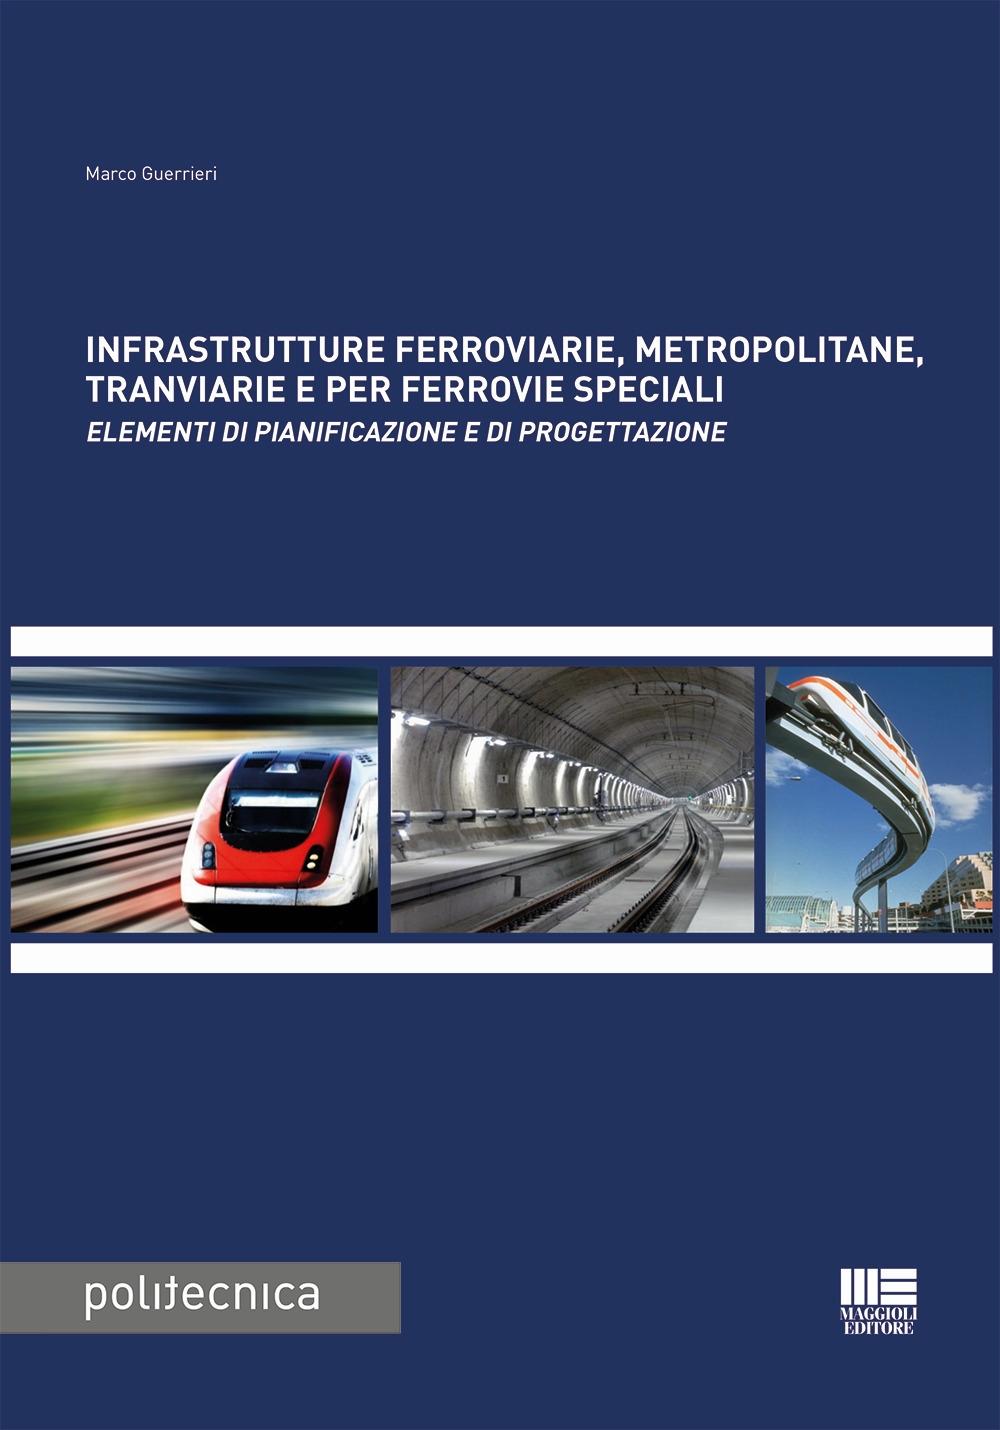 Infrastrutture ferroviarie, metropolitane, tranviarie e per ferrovie speciali. Elementi di pianificazione e di progettazione